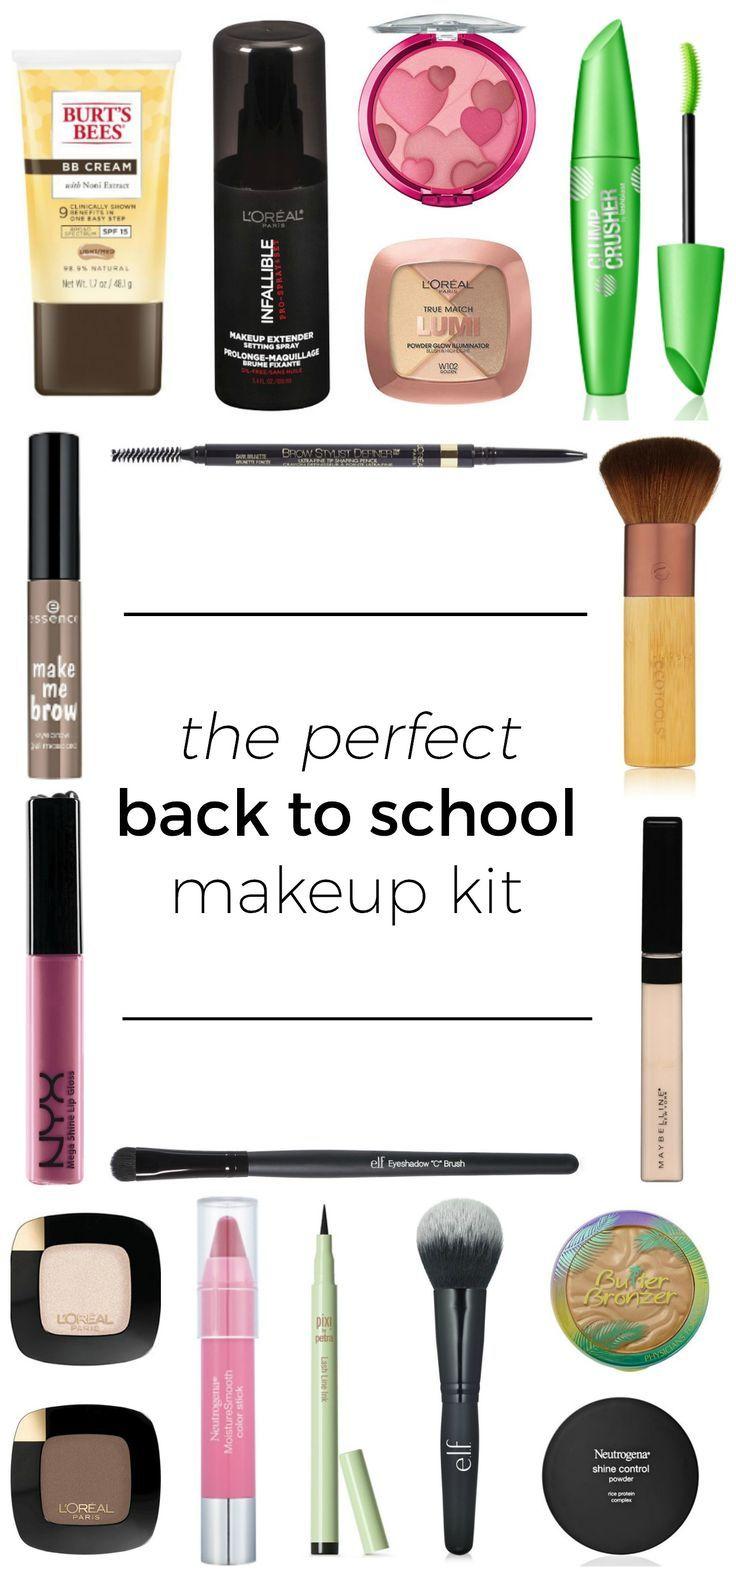 The Perfect Back to School Makeup Kit | Ashley Brooke Nicholas